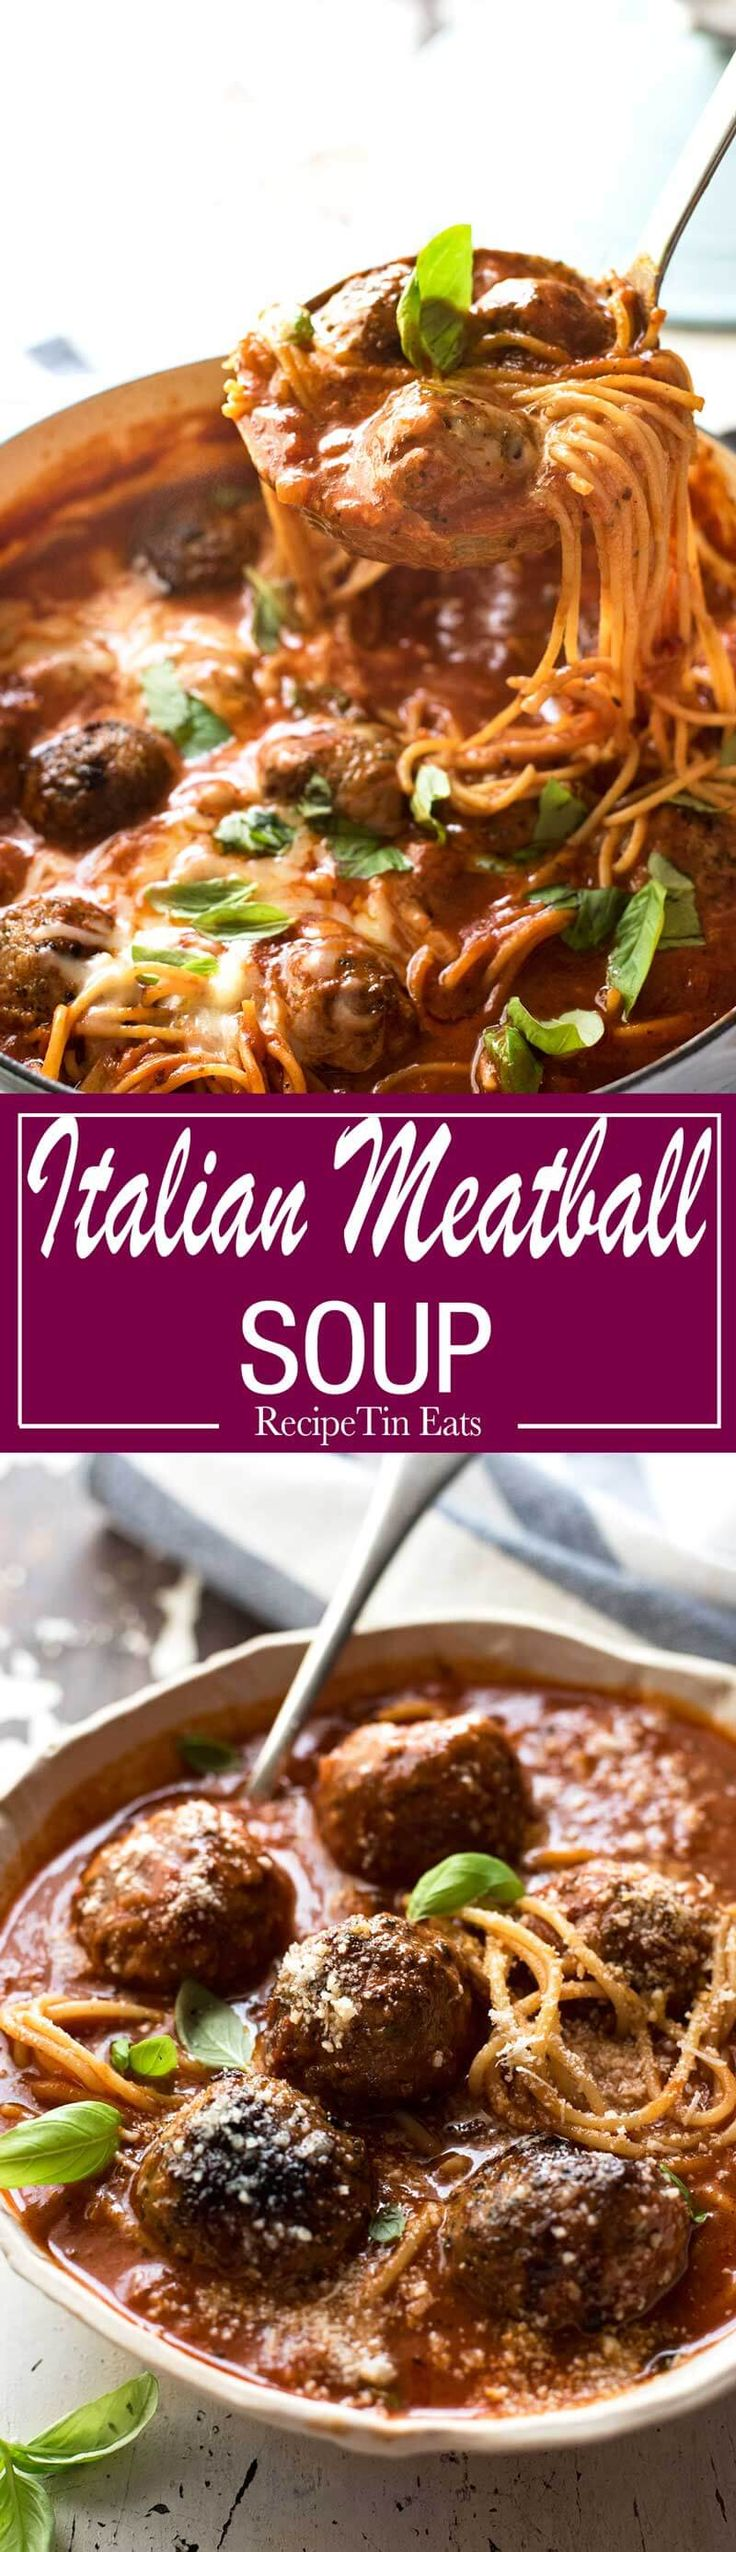 Italian Meatball Soup - Extra juicy, soft & tasty meatballs in a tomato…